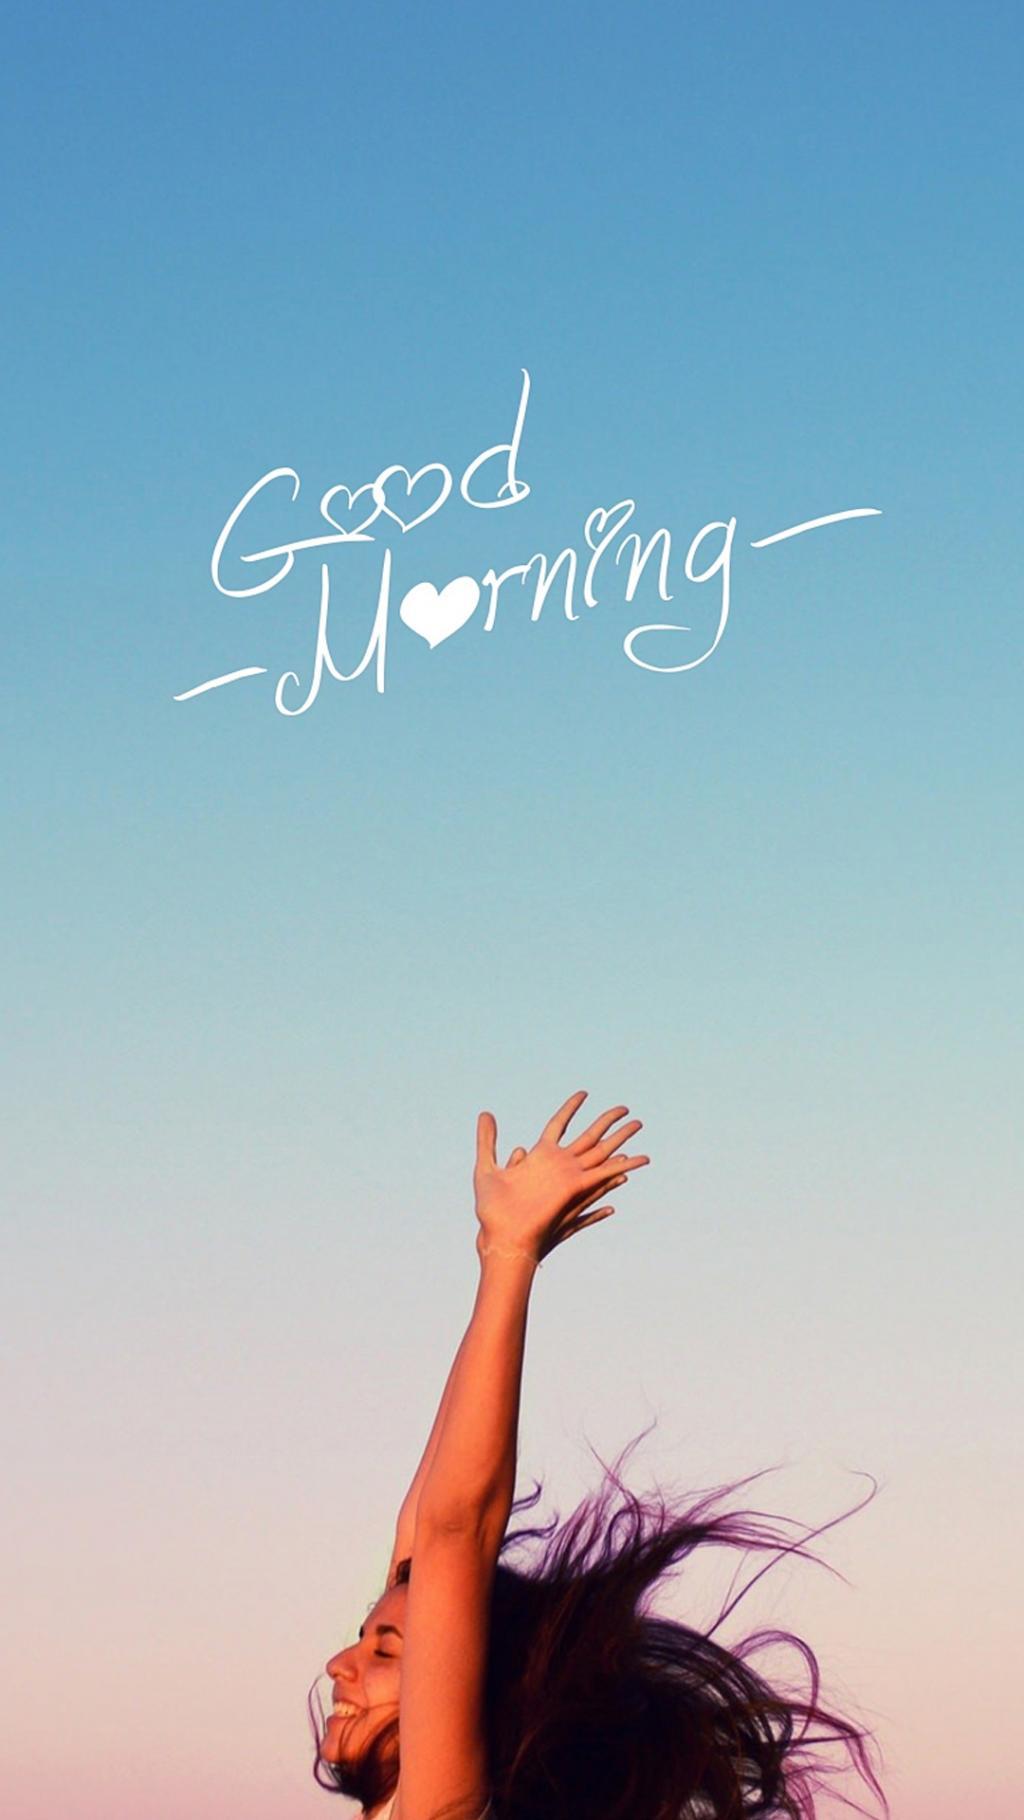 GoodMorning早上好唯美高清手机壁纸图片